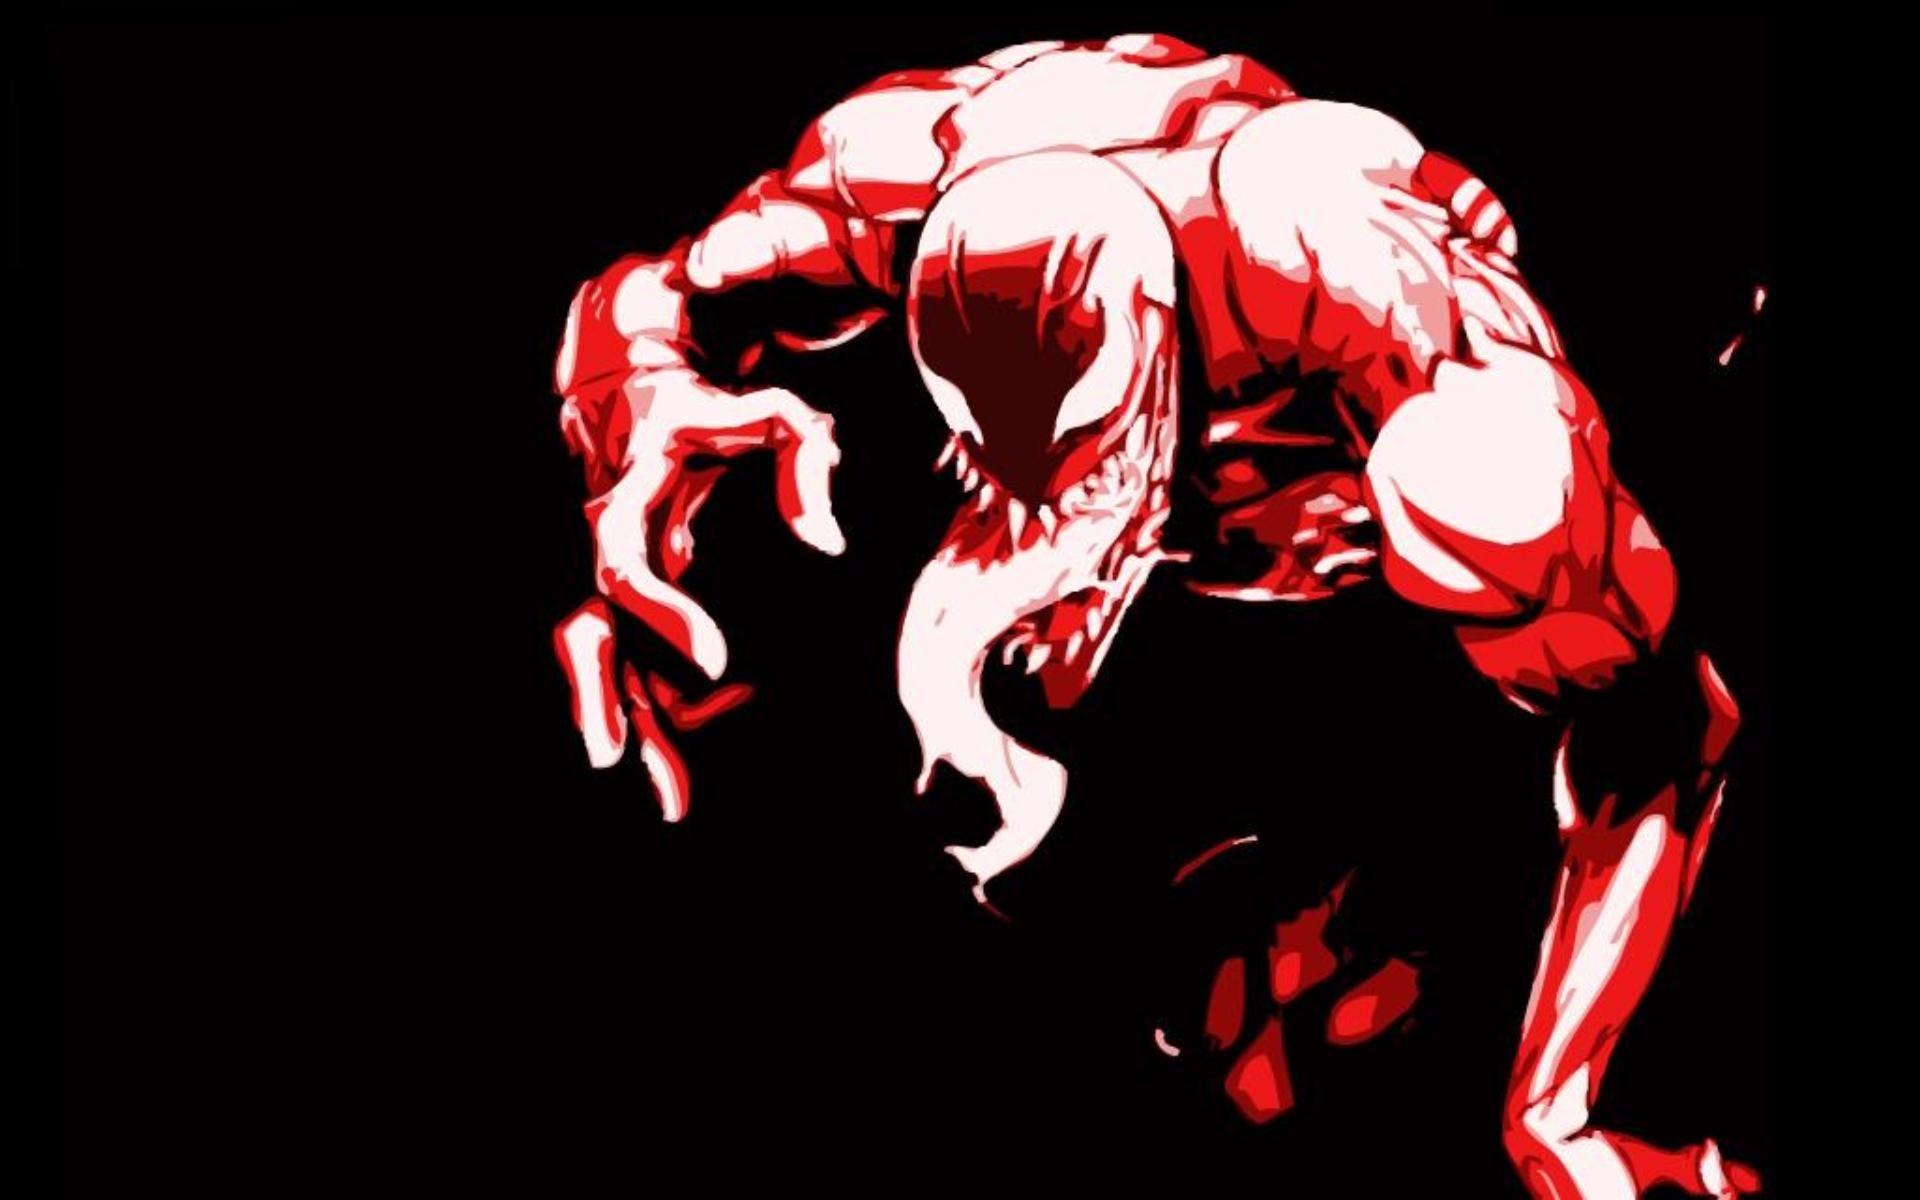 Carnage comics   movies-marvel-comics-carnage-wallpaper-for-desktop